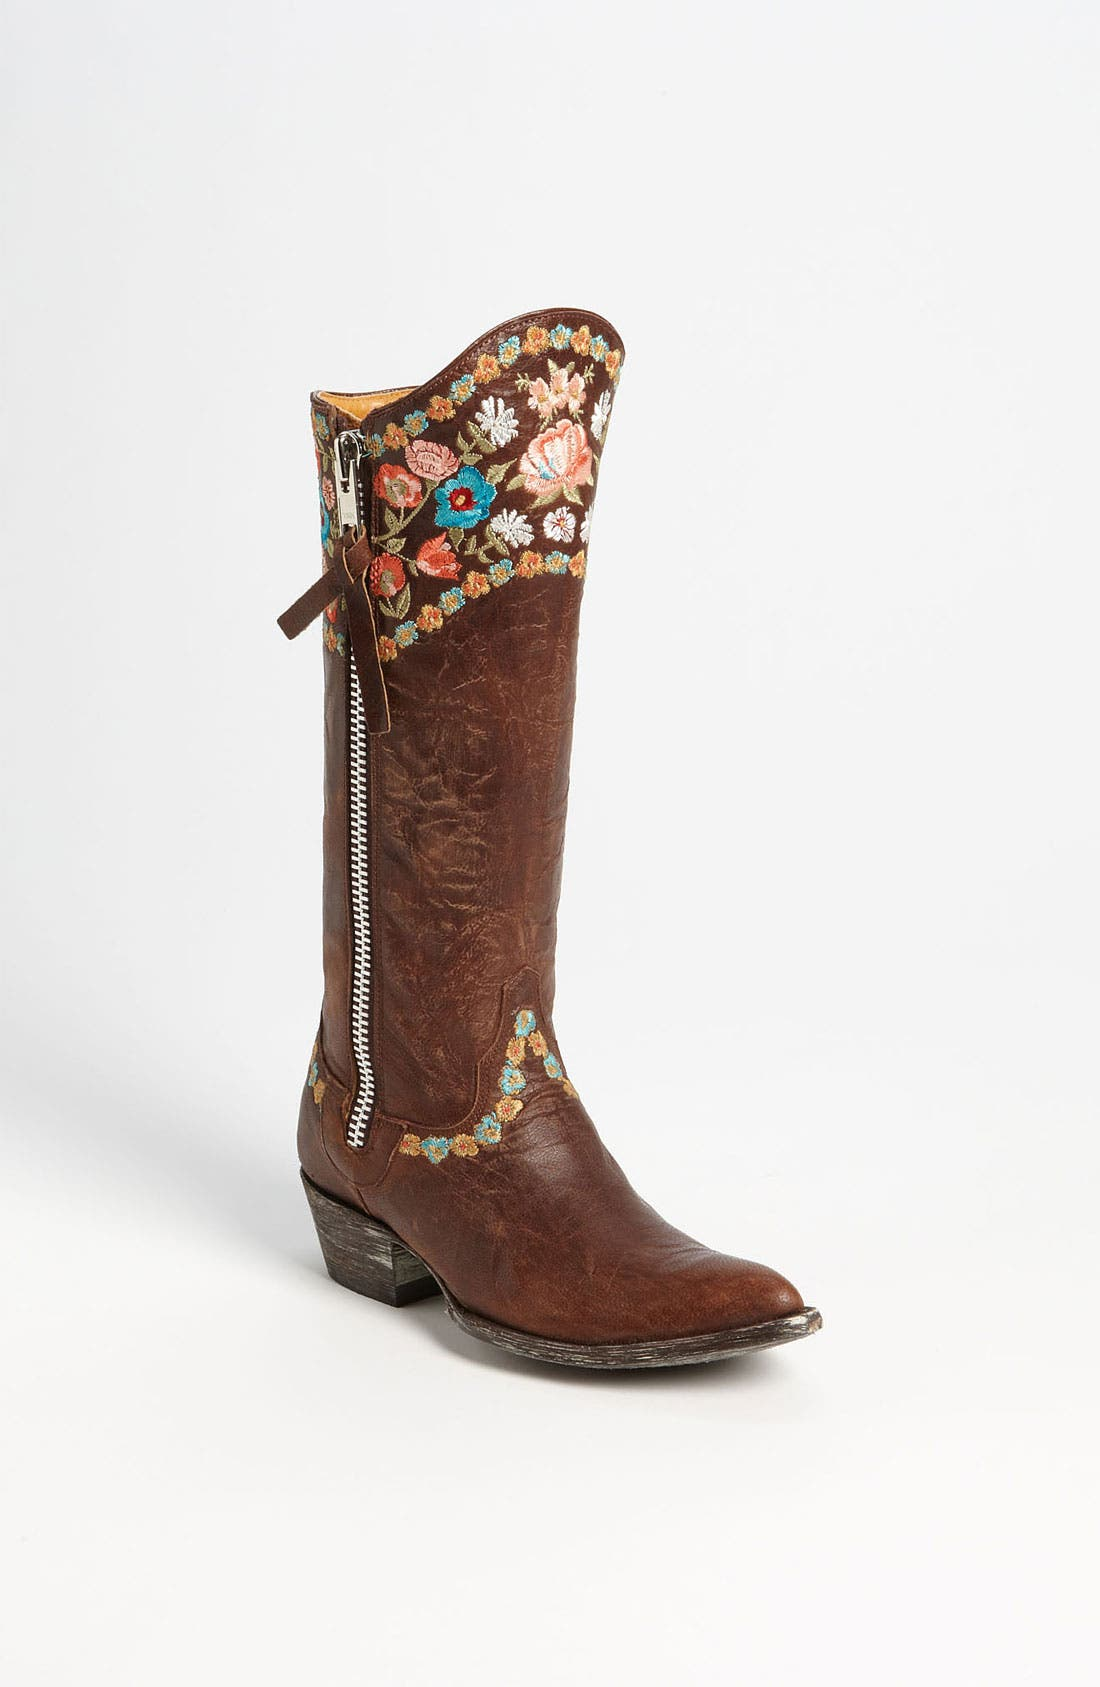 Alternate Image 1 Selected - Old Gringo 'Gaylarazz' Boot